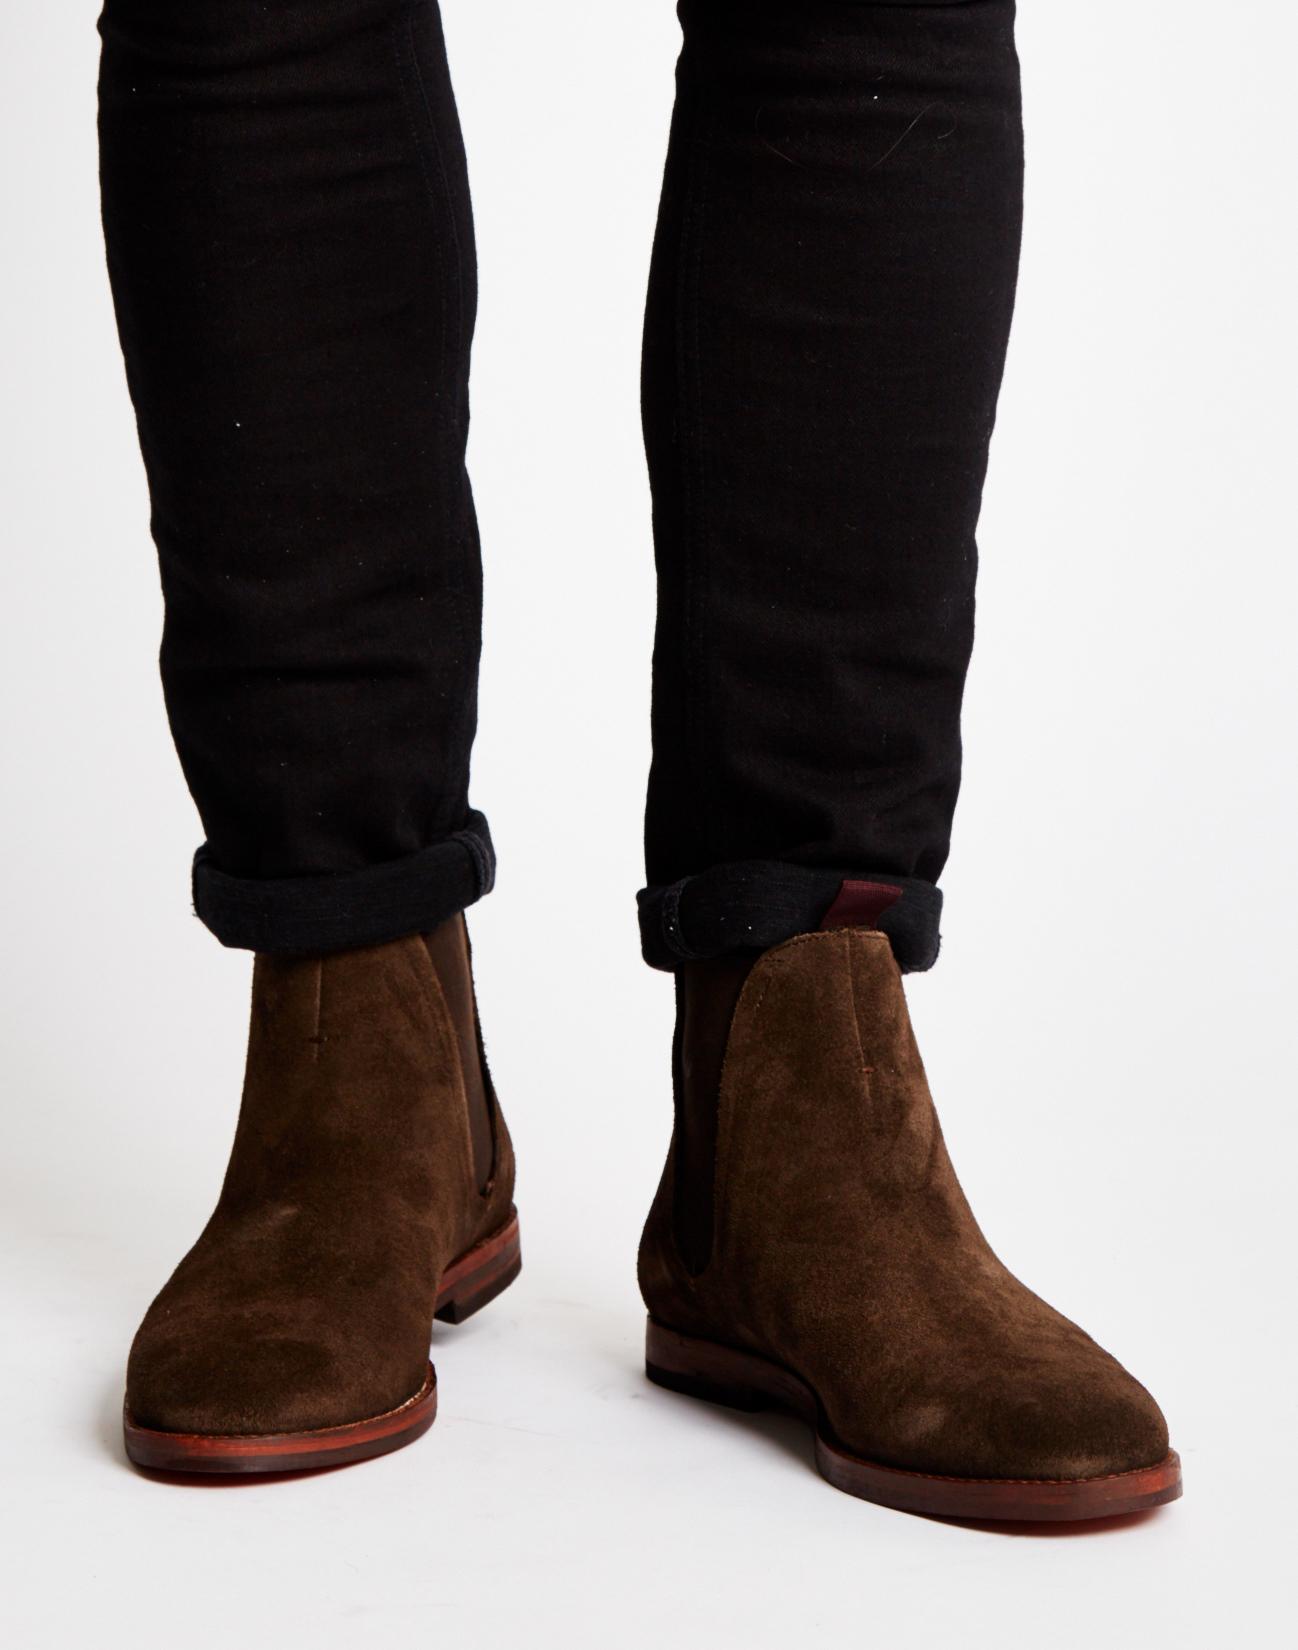 Hudson Jeans Tamper Suede Chelsea Boots In Brown For Men